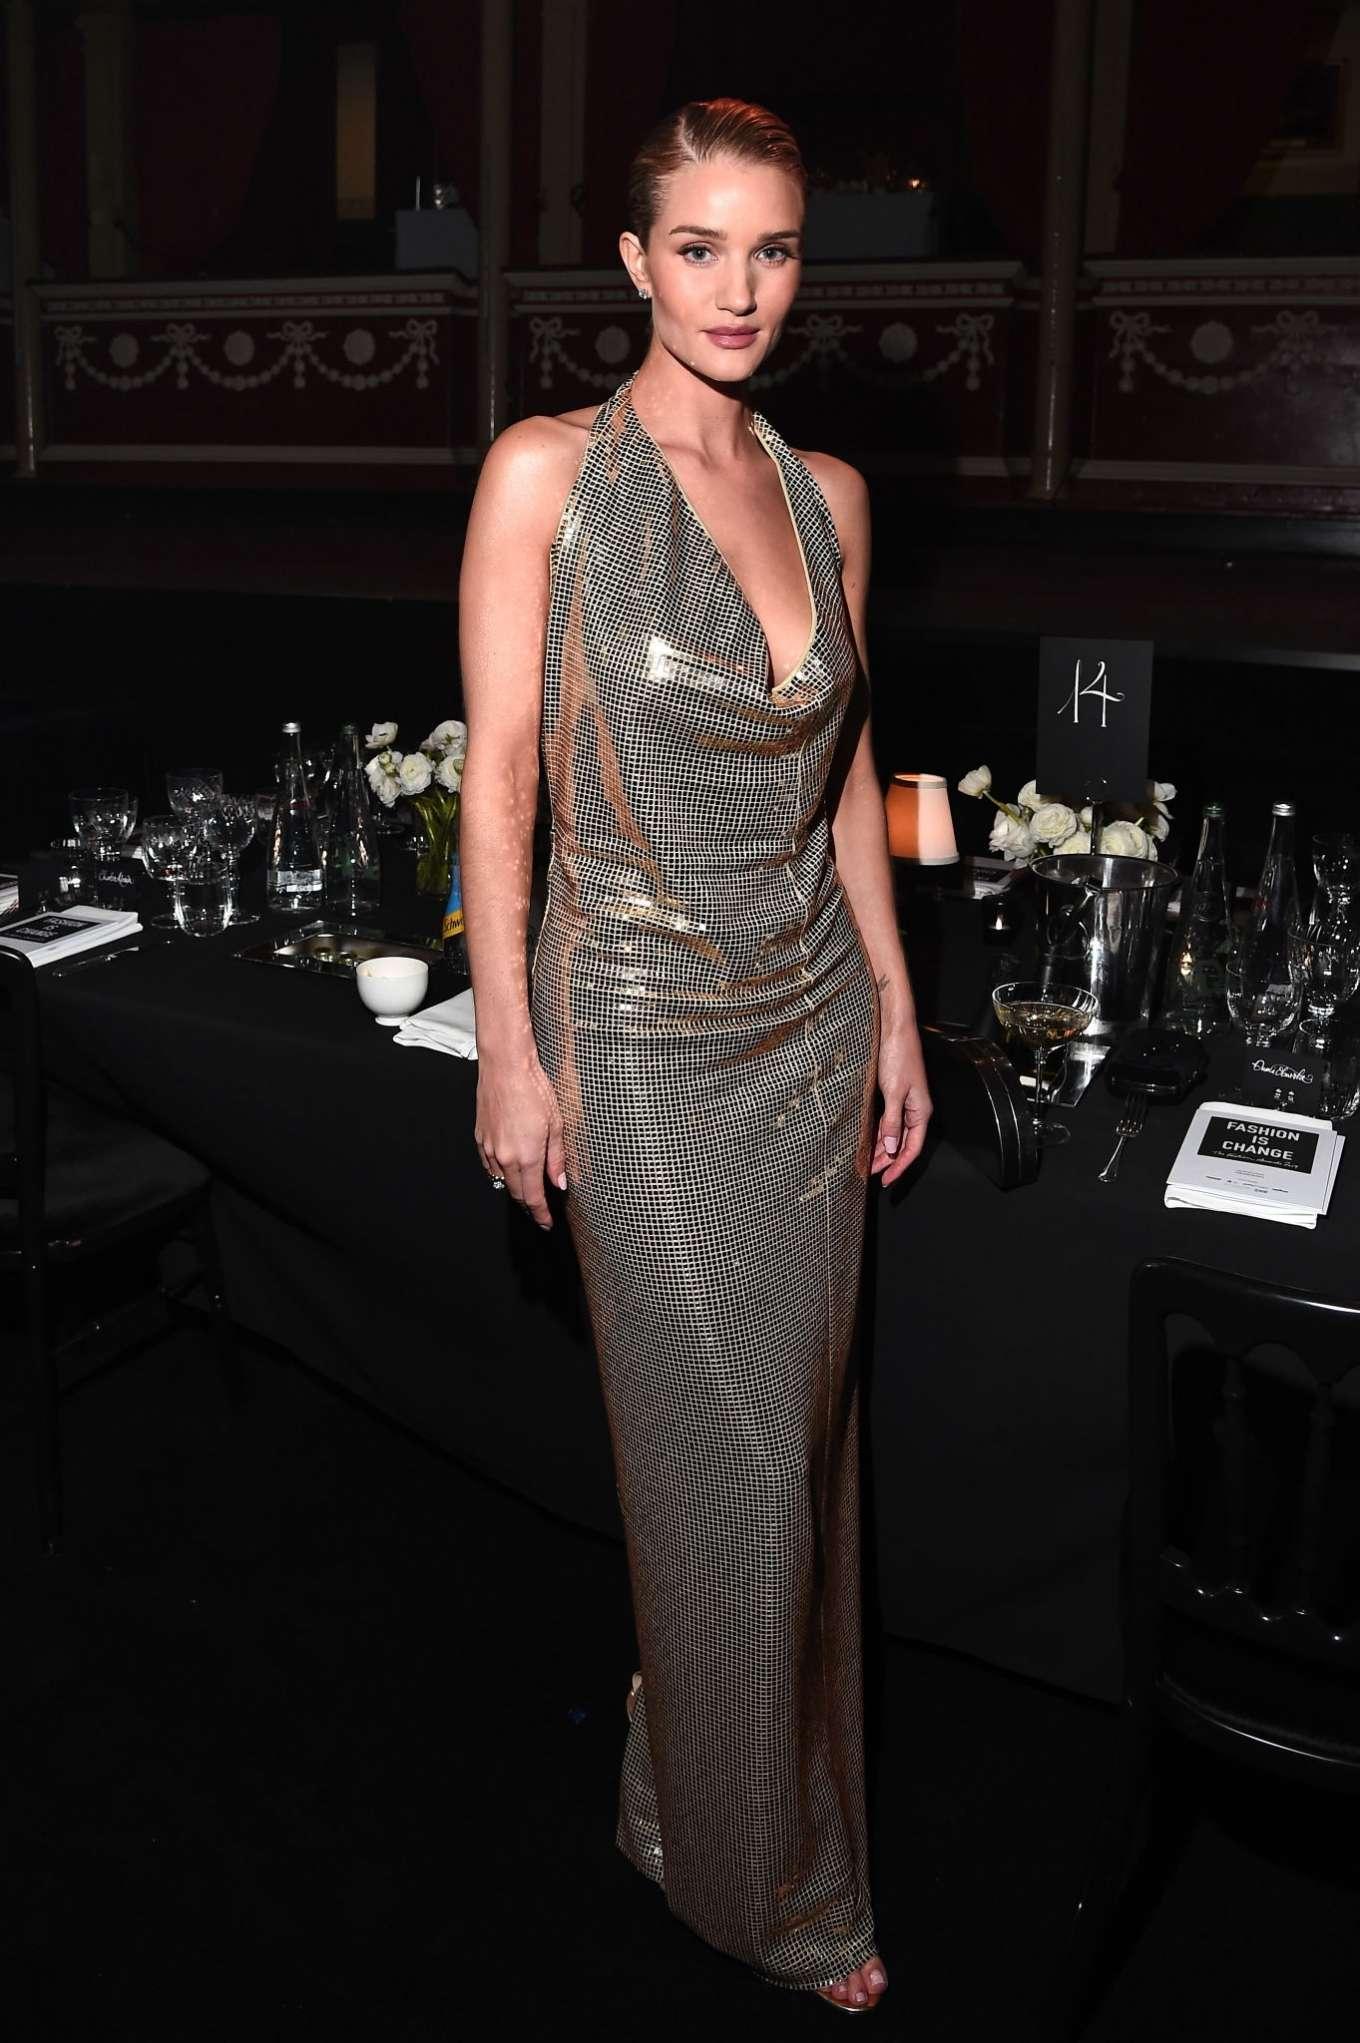 Rosie Hungtington Whiteley 2019 : Rosie Hungtington Whiteley – Fashion Awards 2019 in London-13